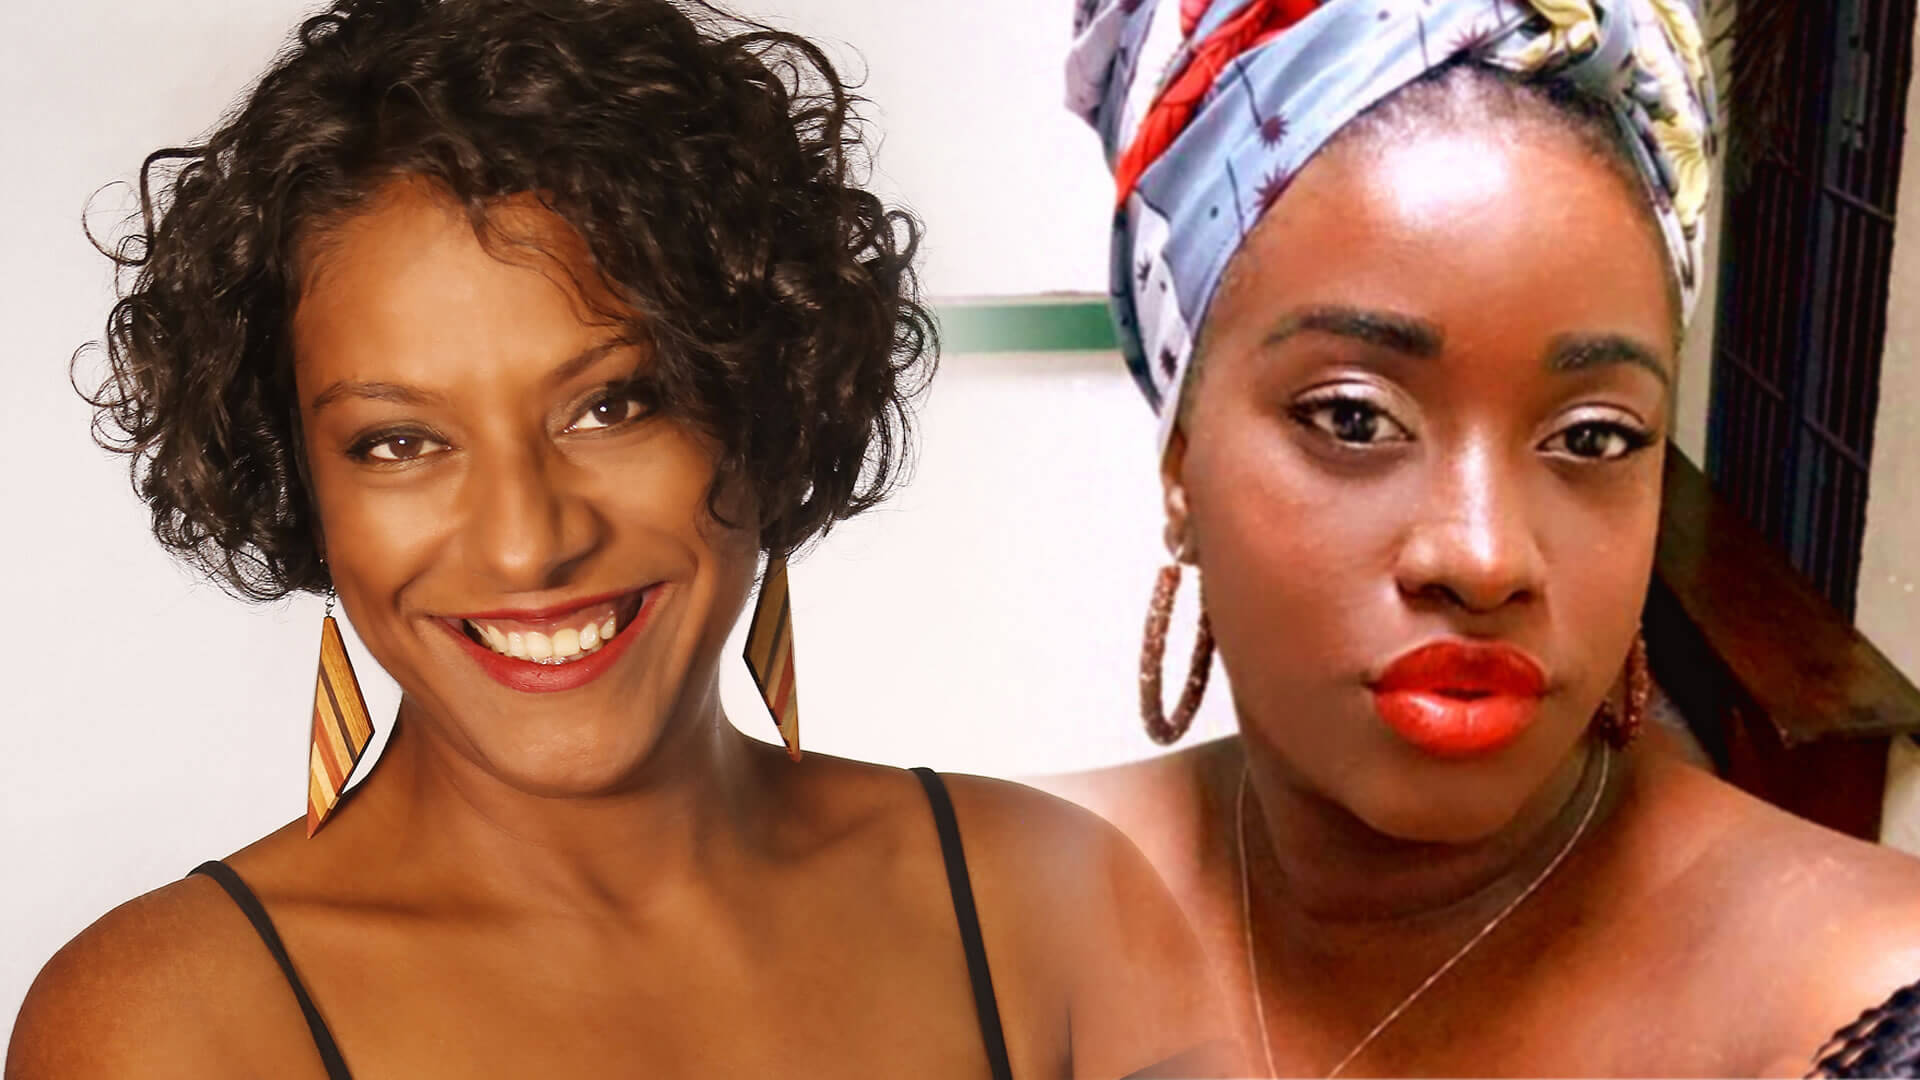 Mulheres que Leem Mulheres: Waleska Barbosa recebe Luana Leandro